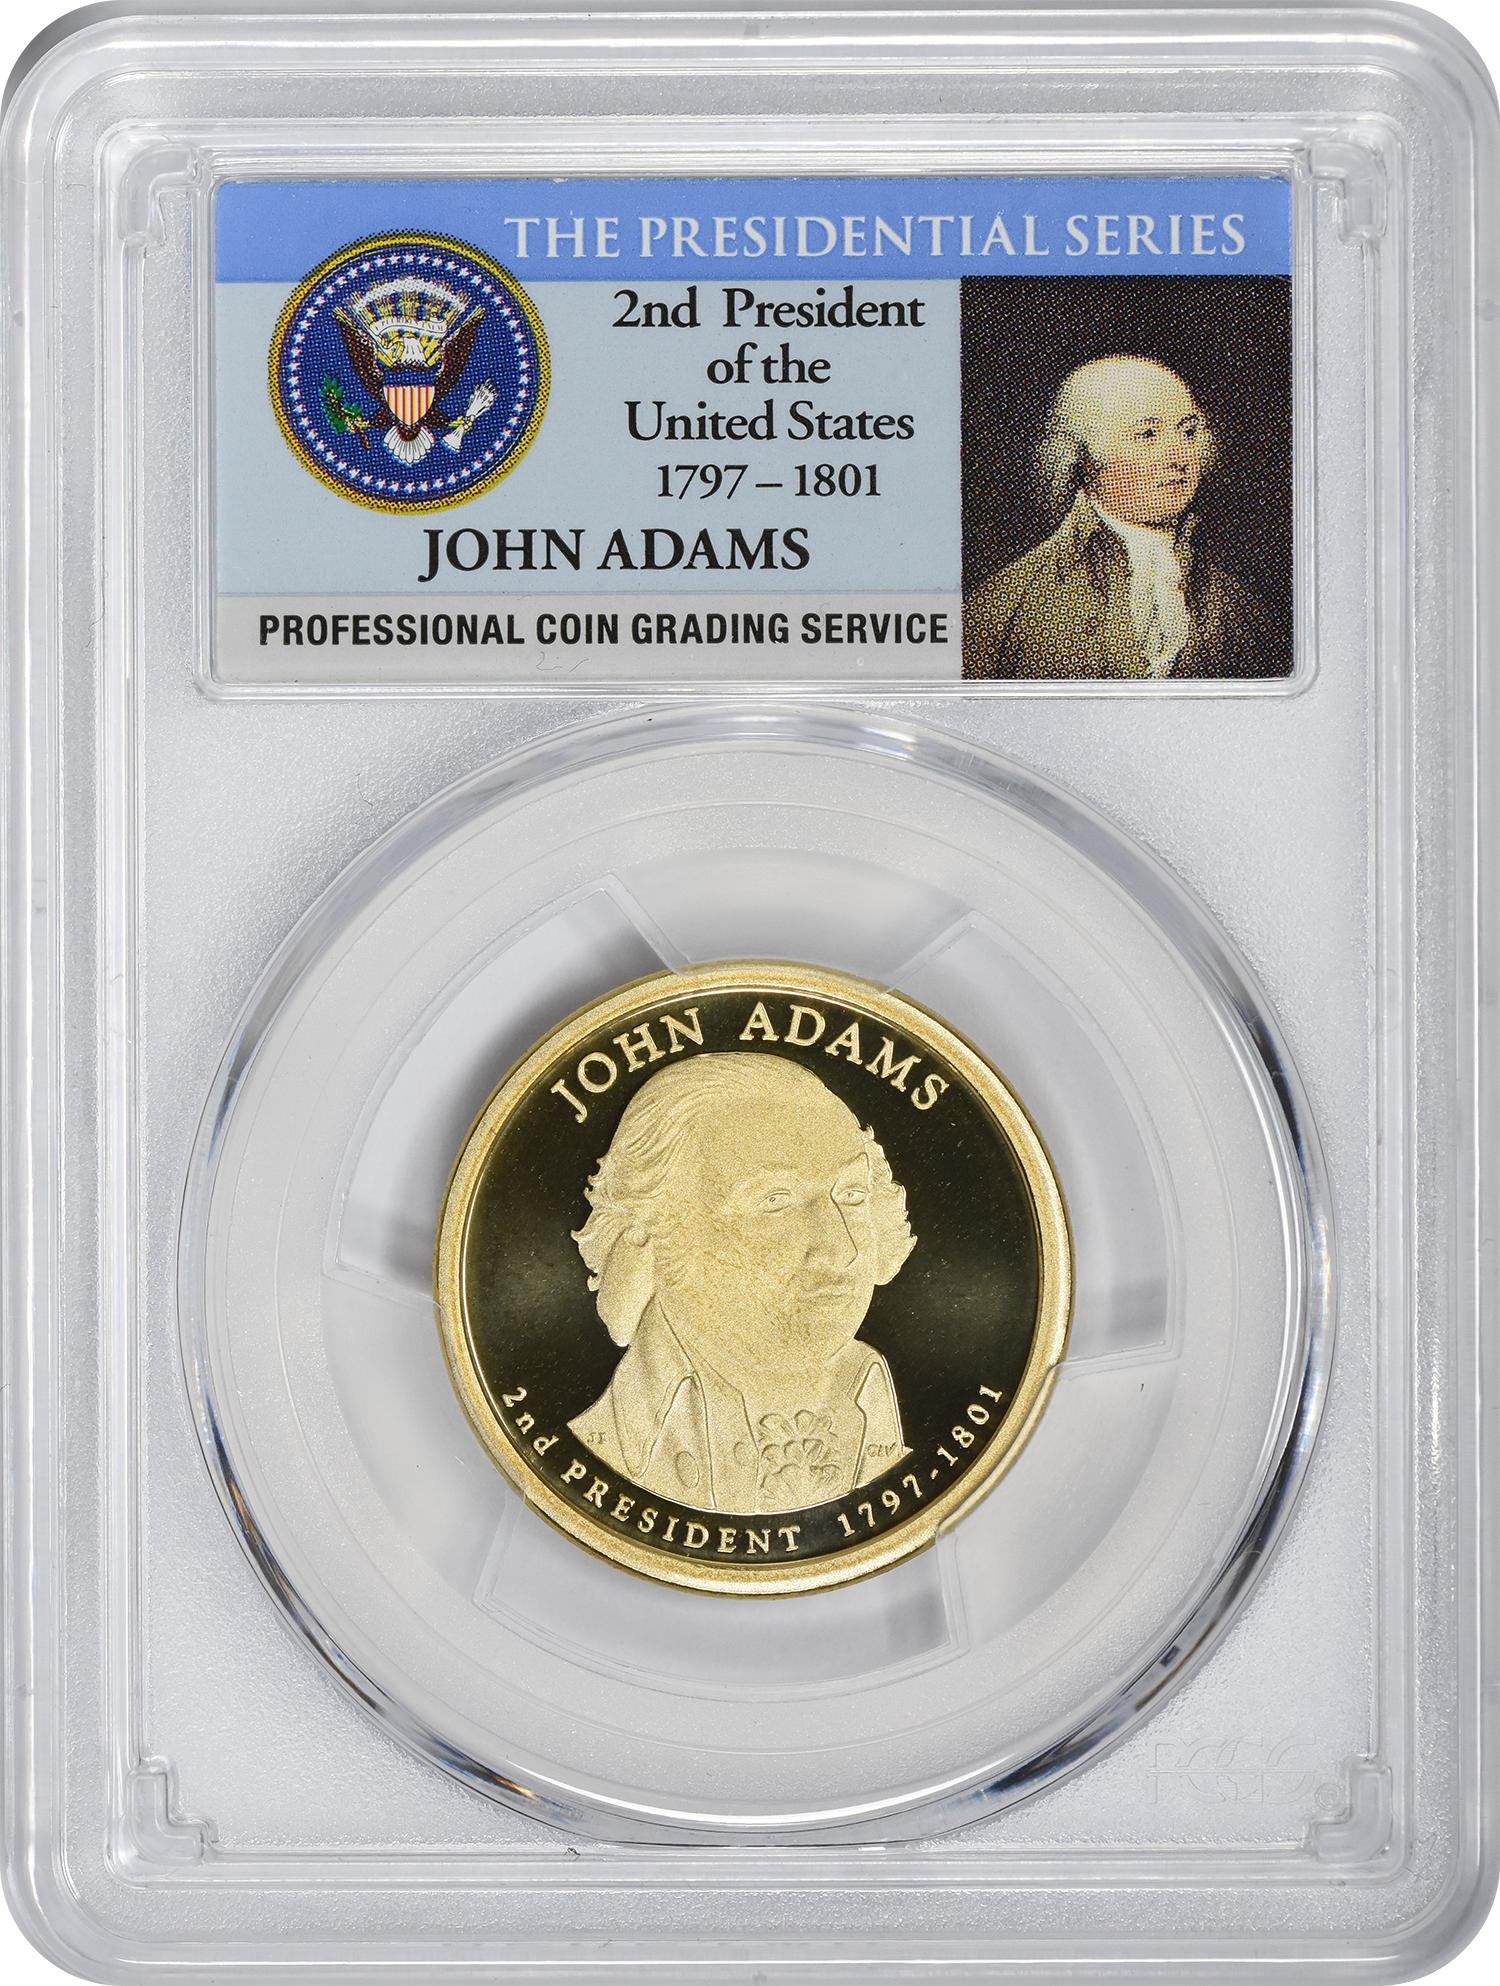 2007-S John Adams Presidential Dollar, PR70DCAM, PCGS